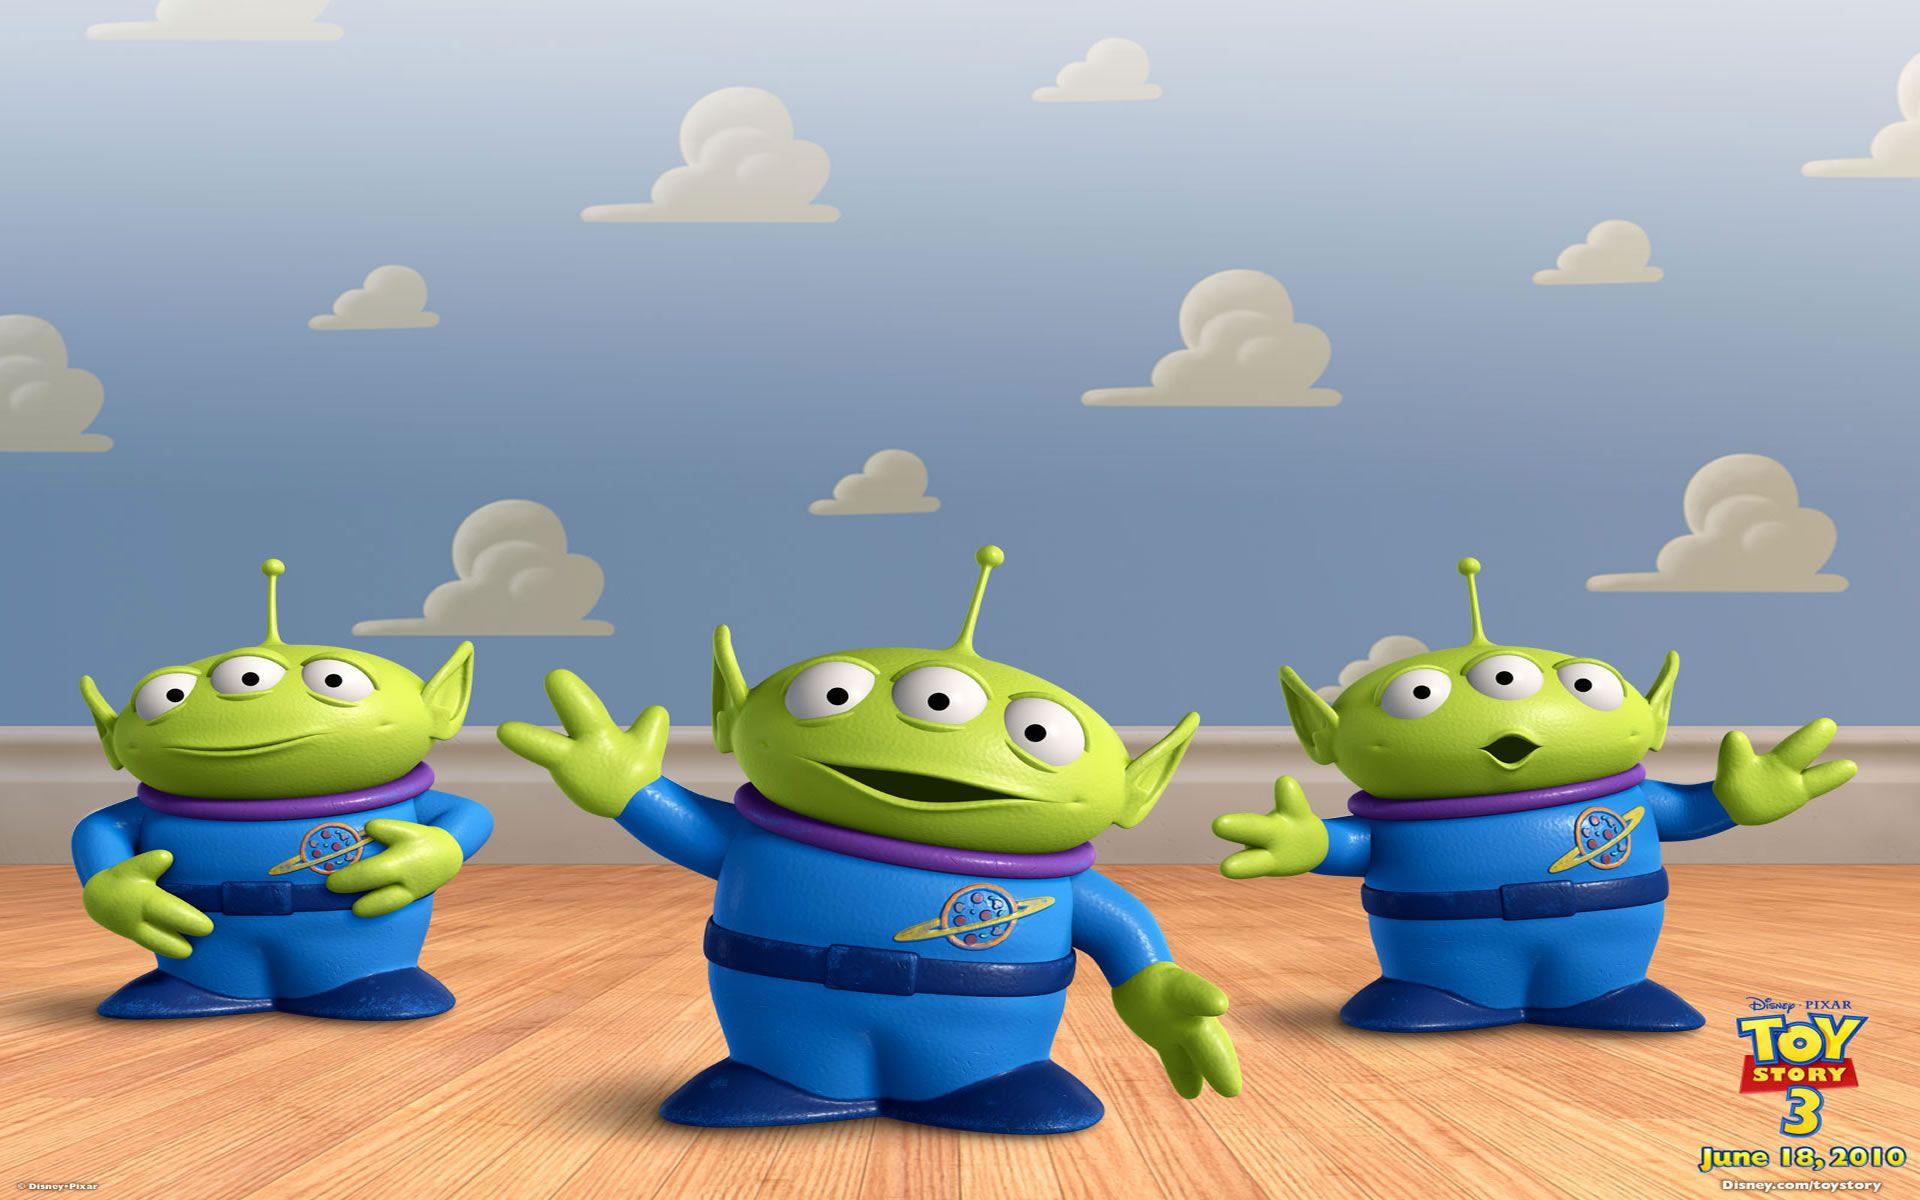 Toy Story Archives « HD Cartoon WallpapersHD Cartoon